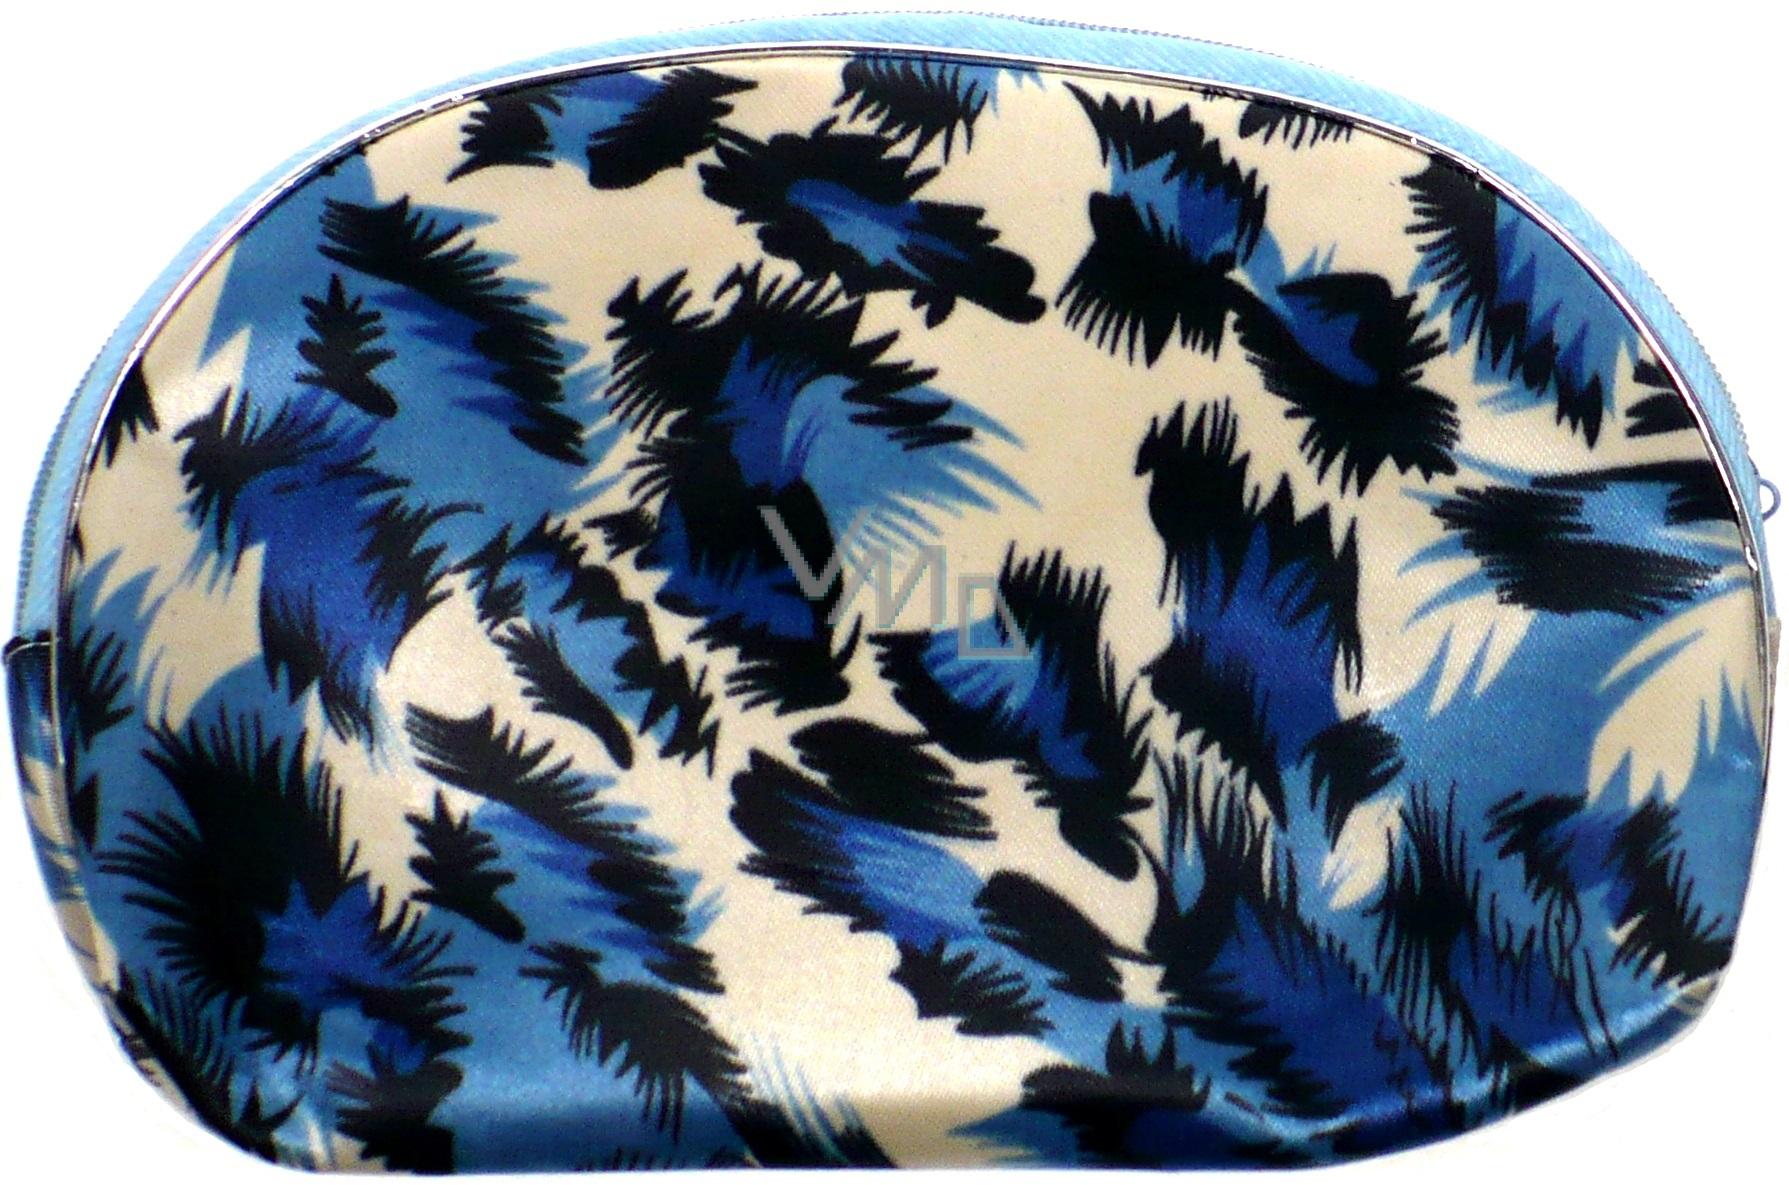 Etue Tygrovitá bílo-modro-černá 20 x 13 x 1,5 cm 1 kus 70190